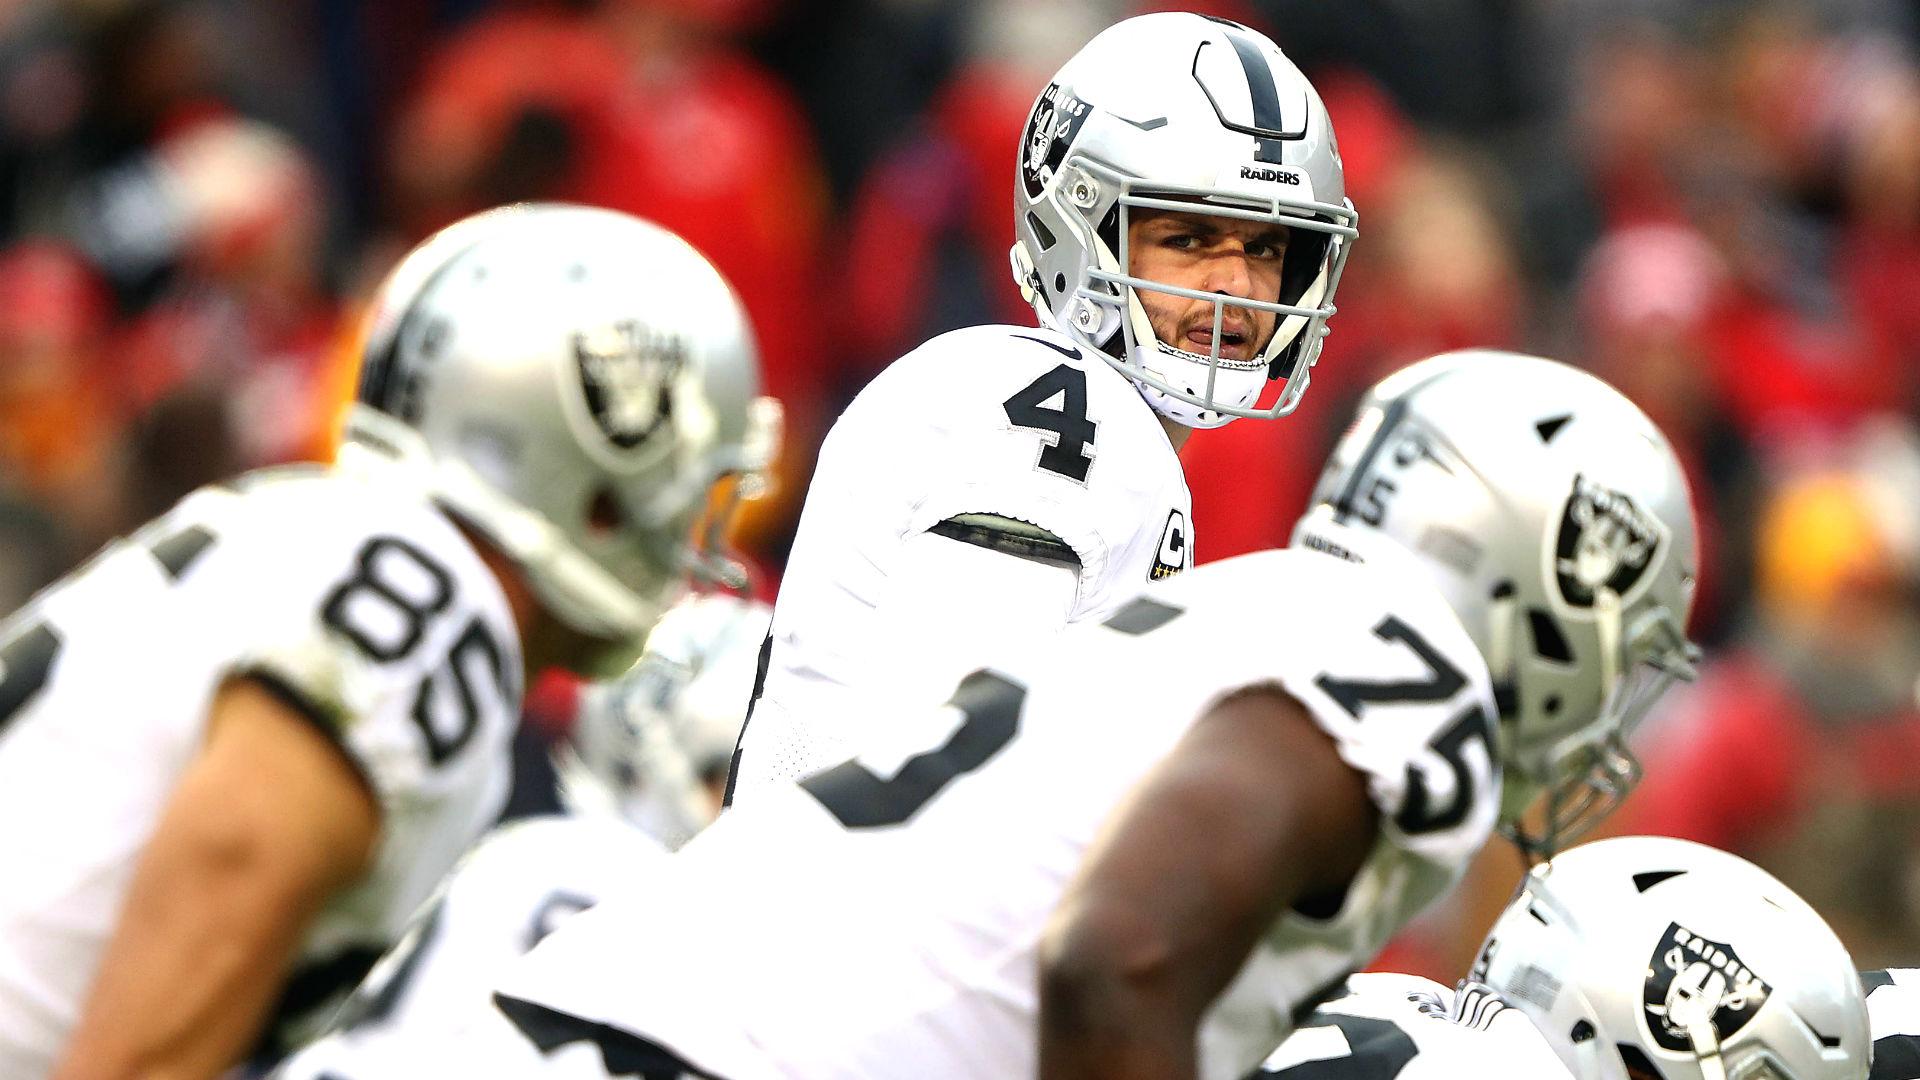 Raiders 2019 Depth Chart Breakdown Antonio Brown Small Part Of Big Change In Oakland Sporting News